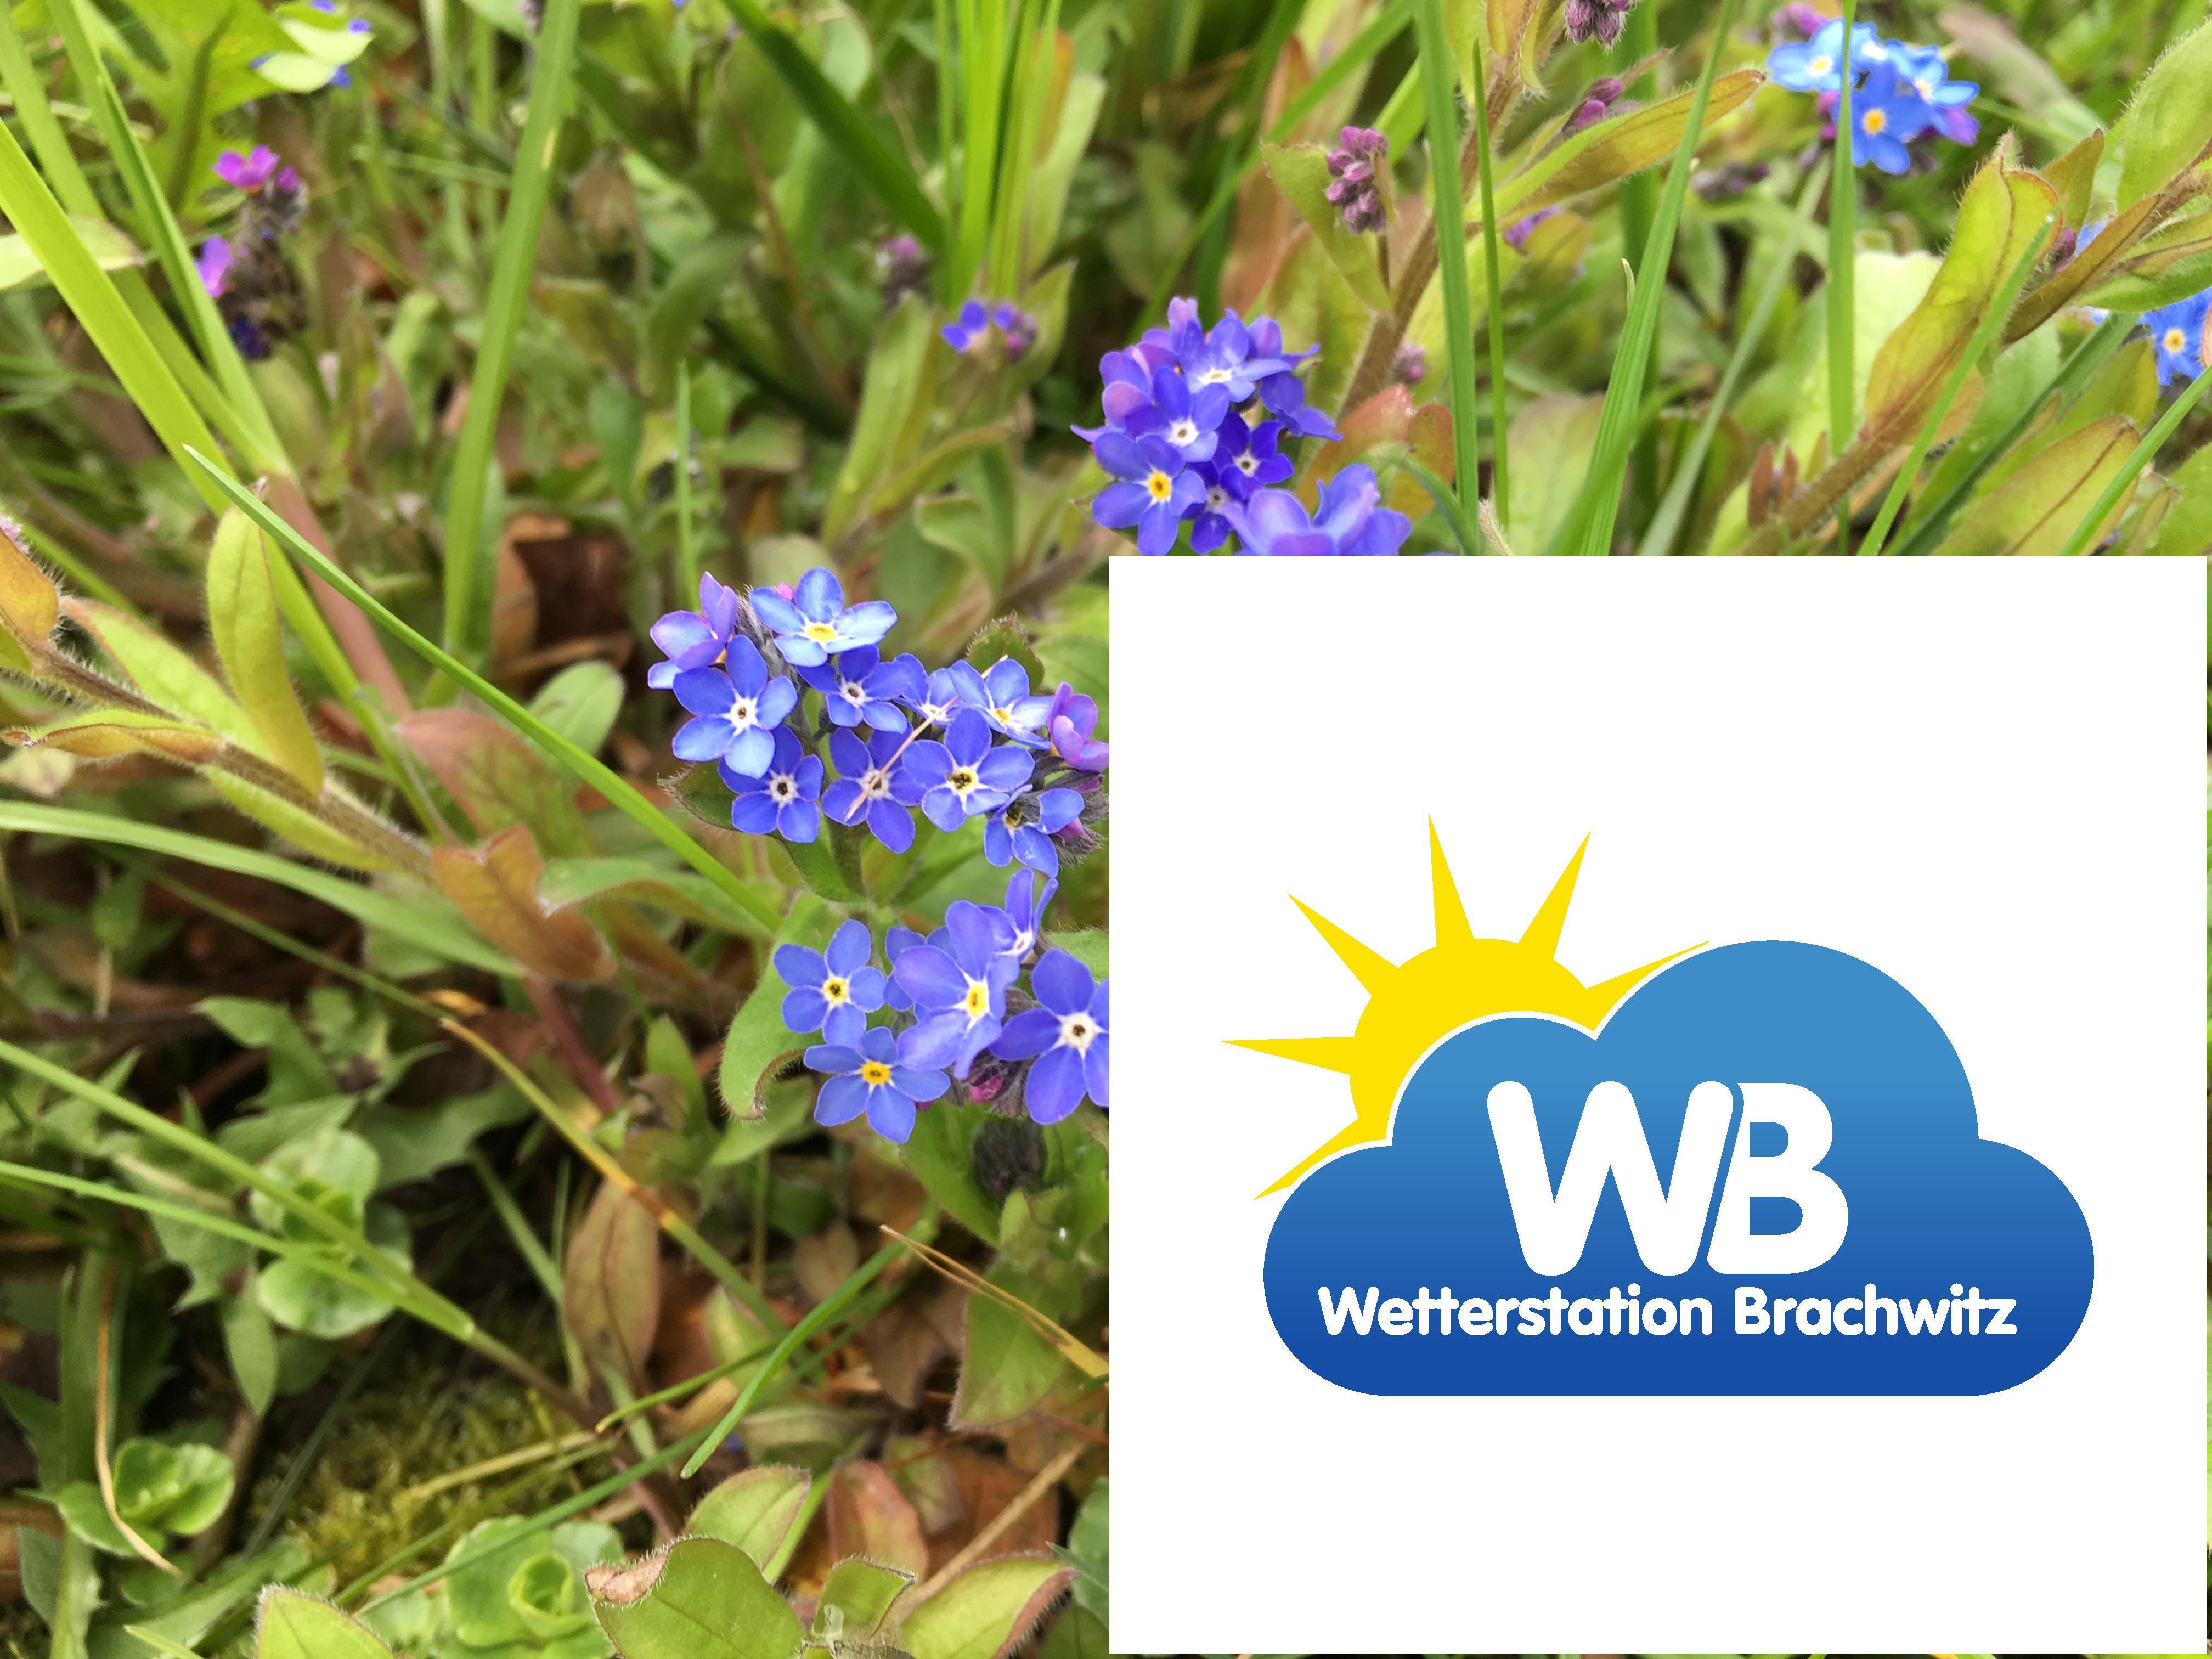 Frühling Frühlingsbilder der Wetterstation Brachwitz